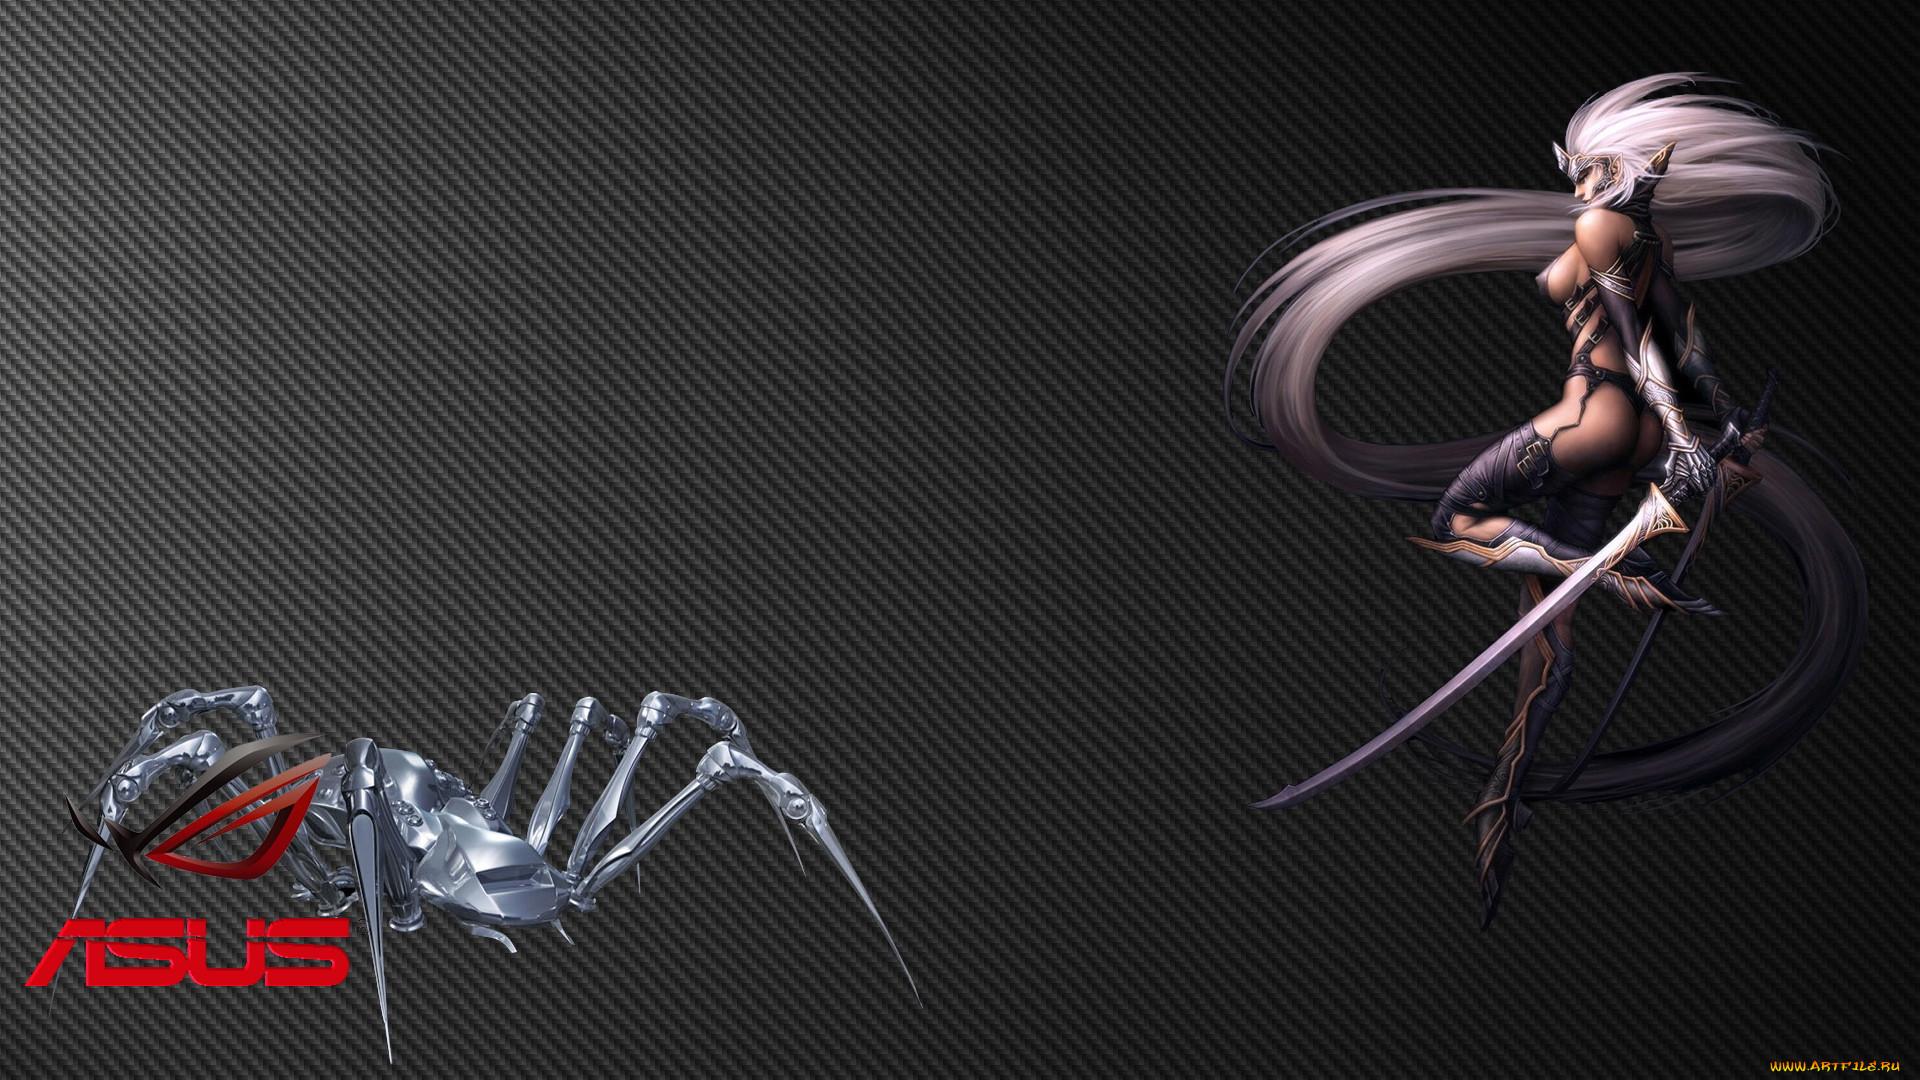 Обои Asus Девушки